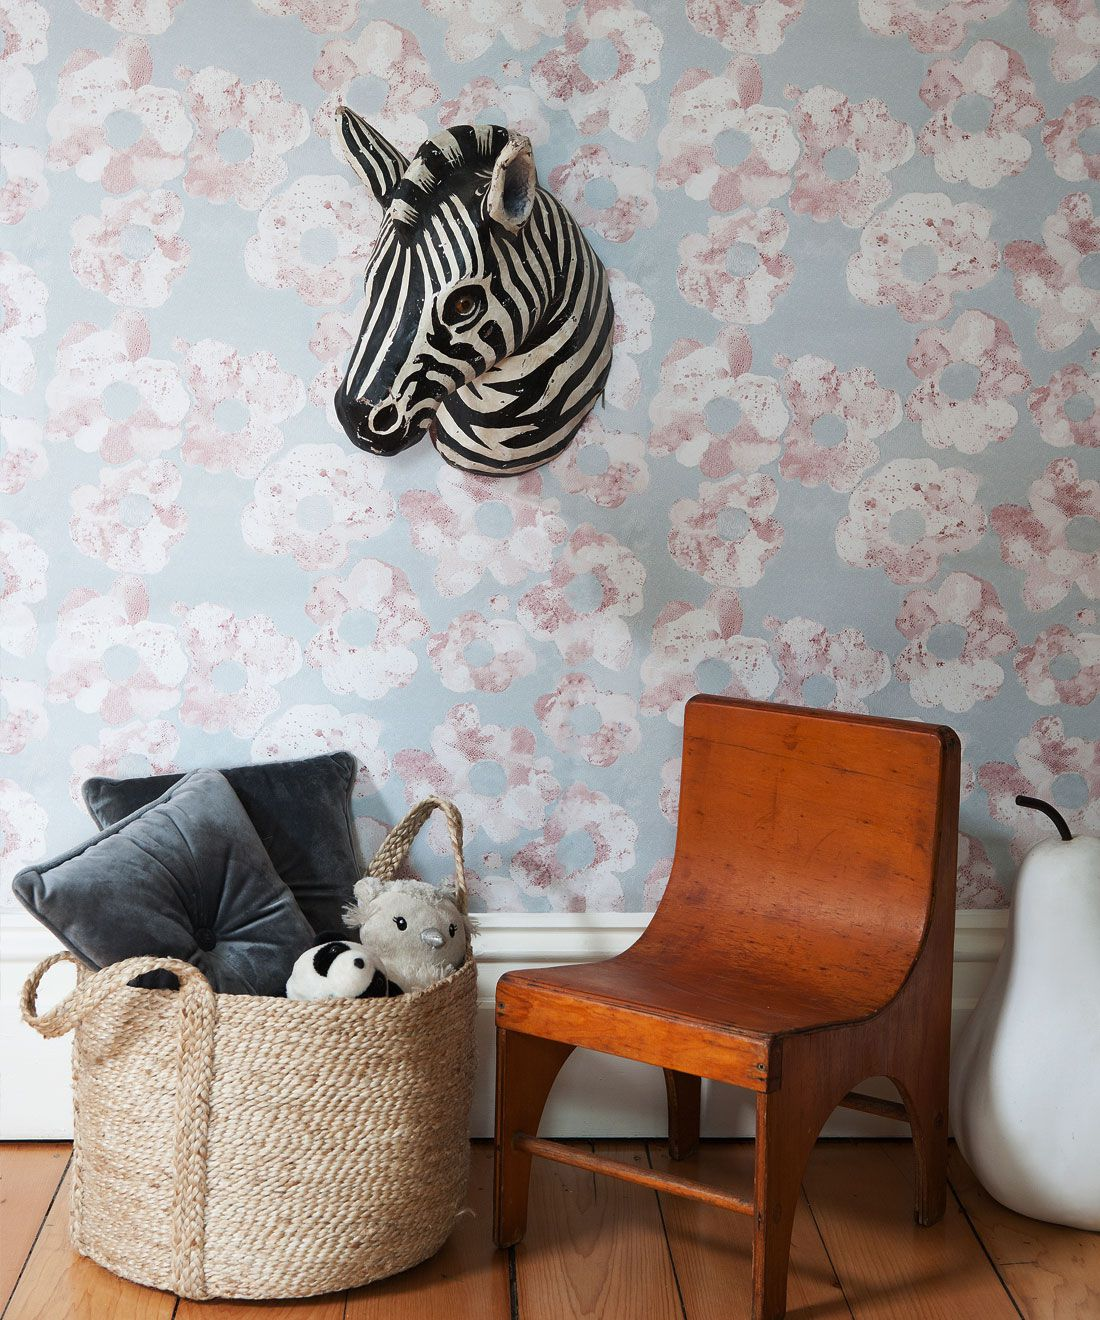 Cherry Blossom Wallpaper • Shibori Floral • Insitu Sage